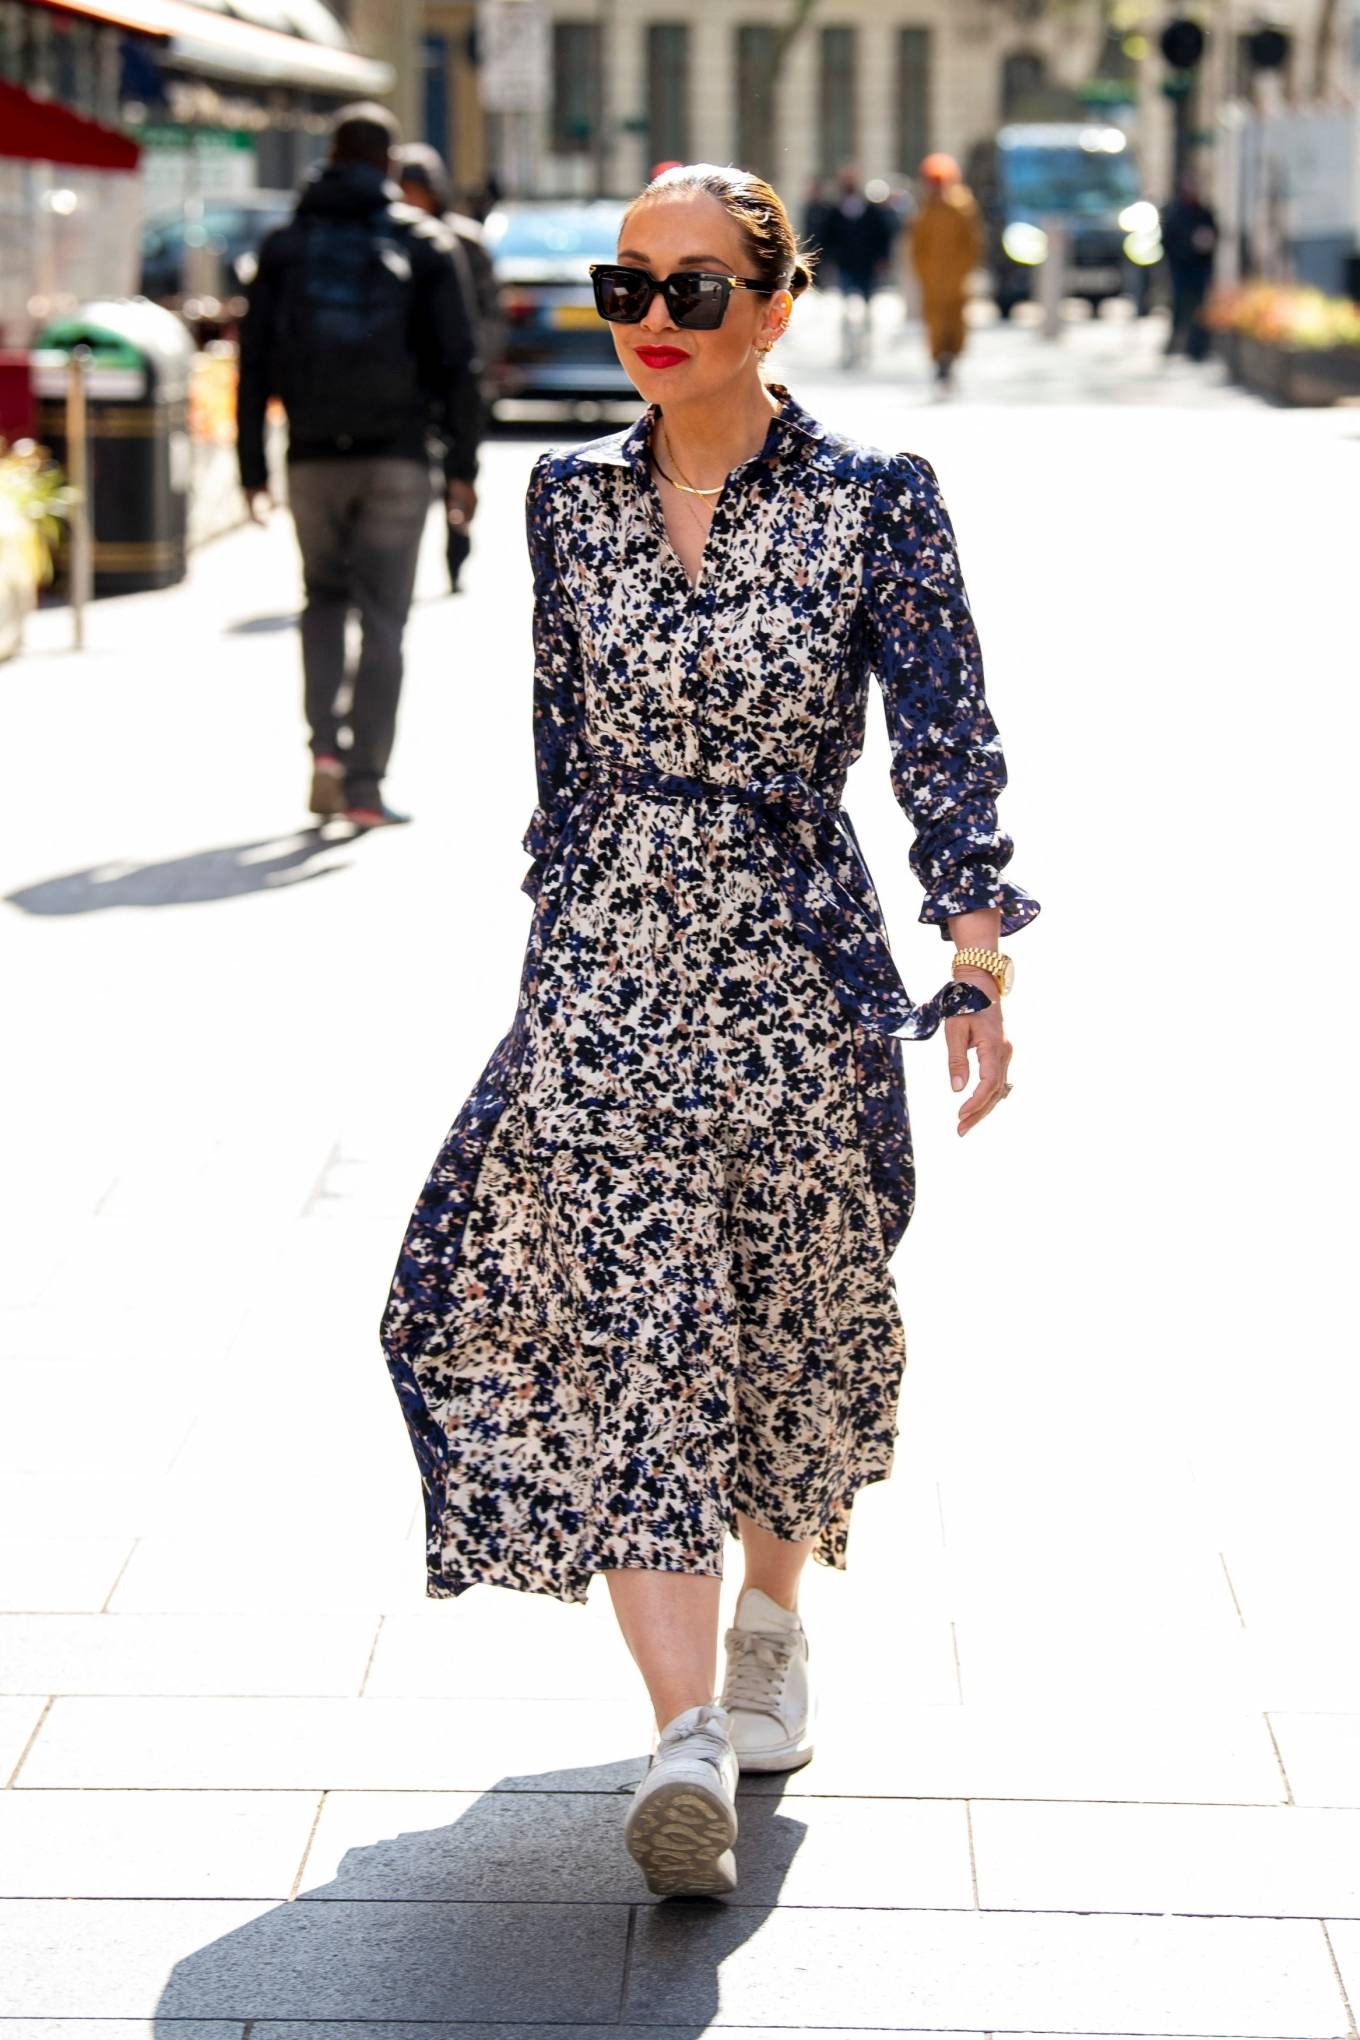 Myleene Klass 2021 : Myleene Klass – In a long summer dress arriving at the Global studios -19